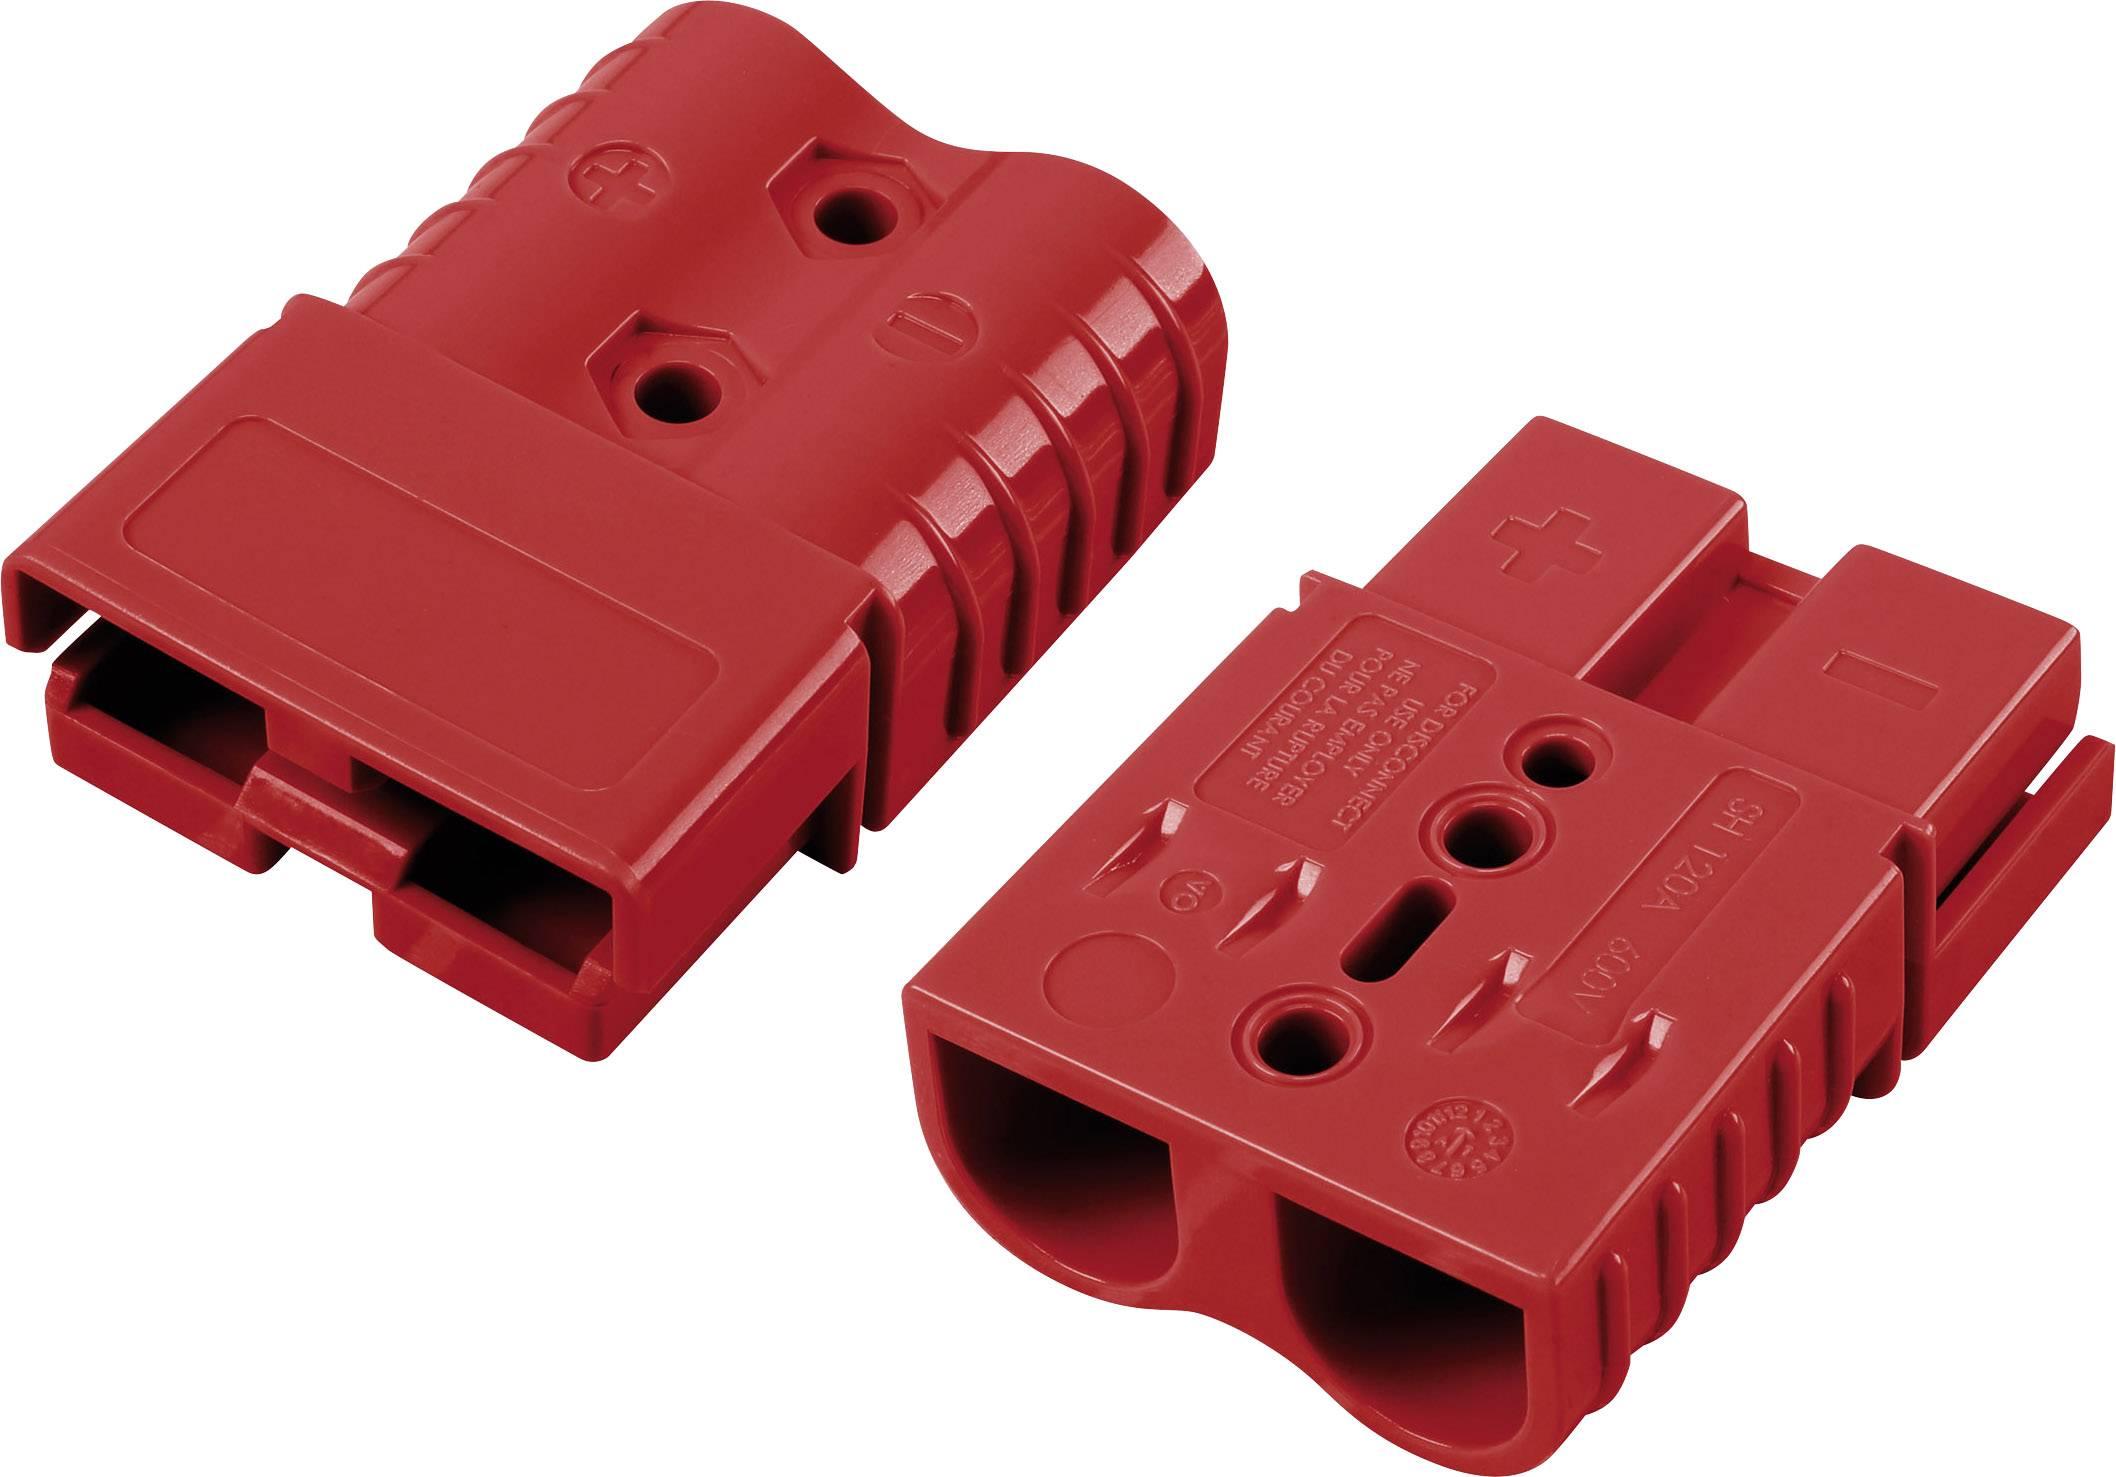 Konektor TRU COMPONENTS 1229372, červená, 1 ks